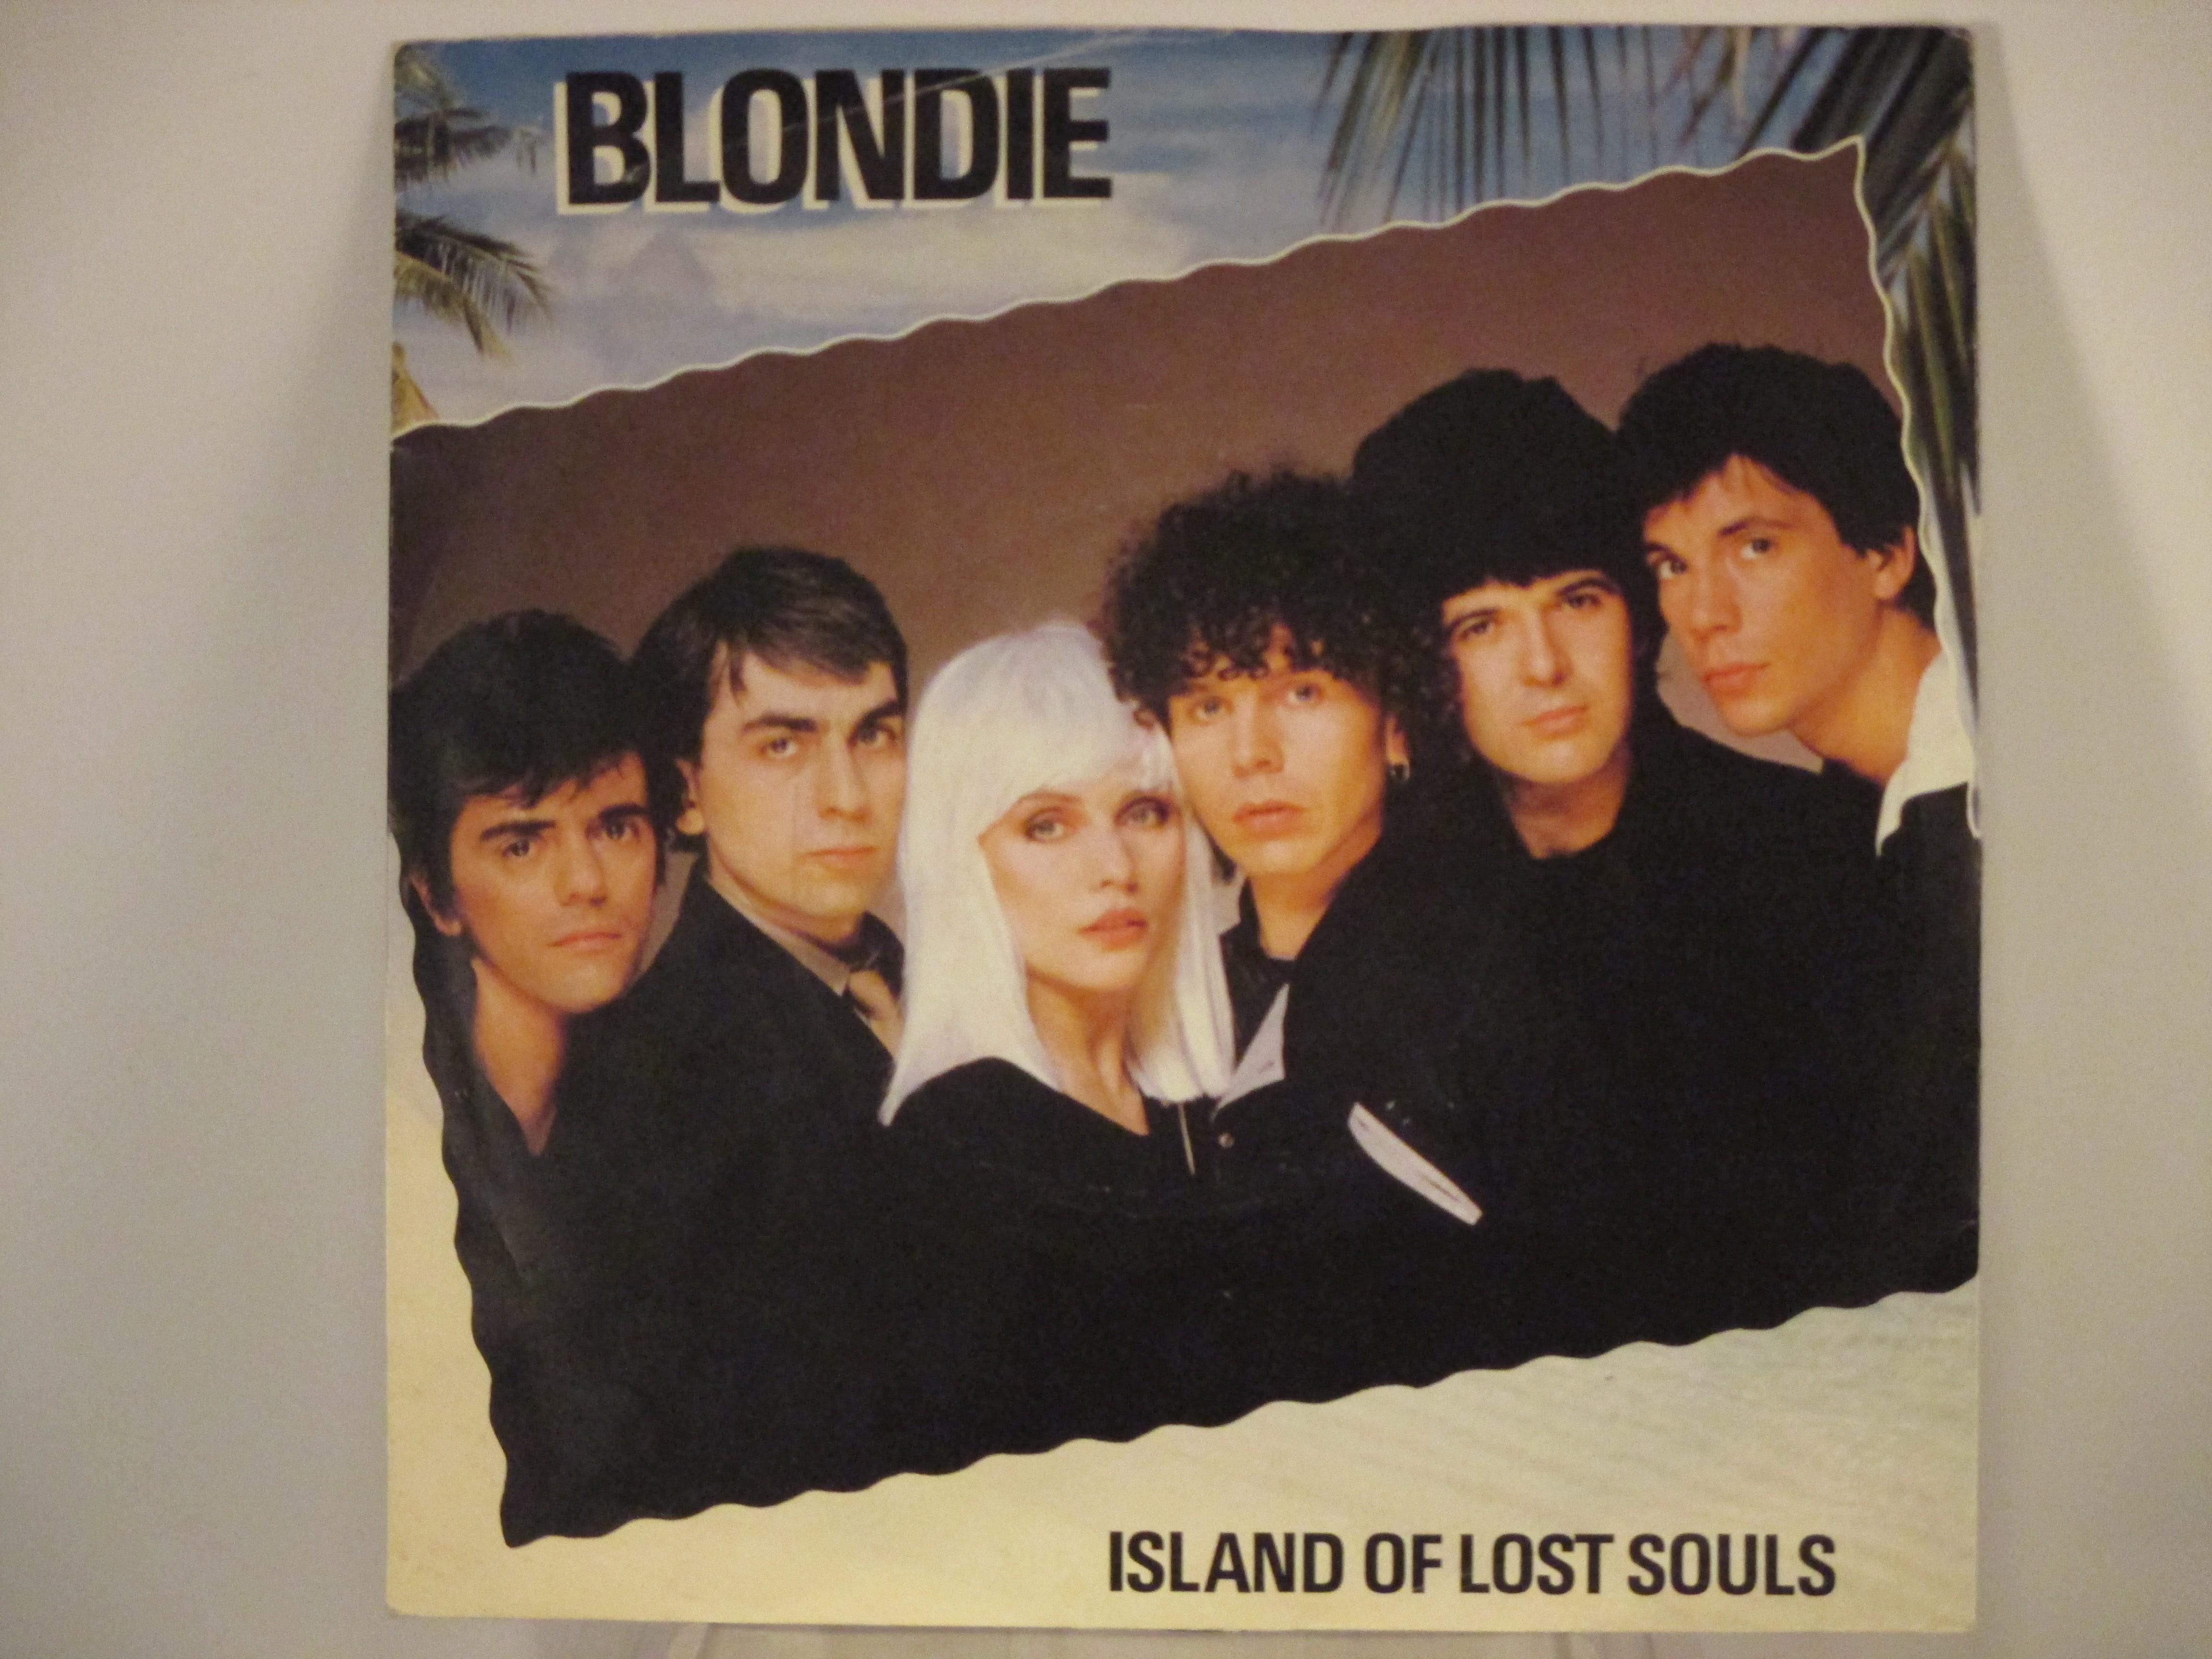 BLONDIE : Island of lost souls / Dragonfly